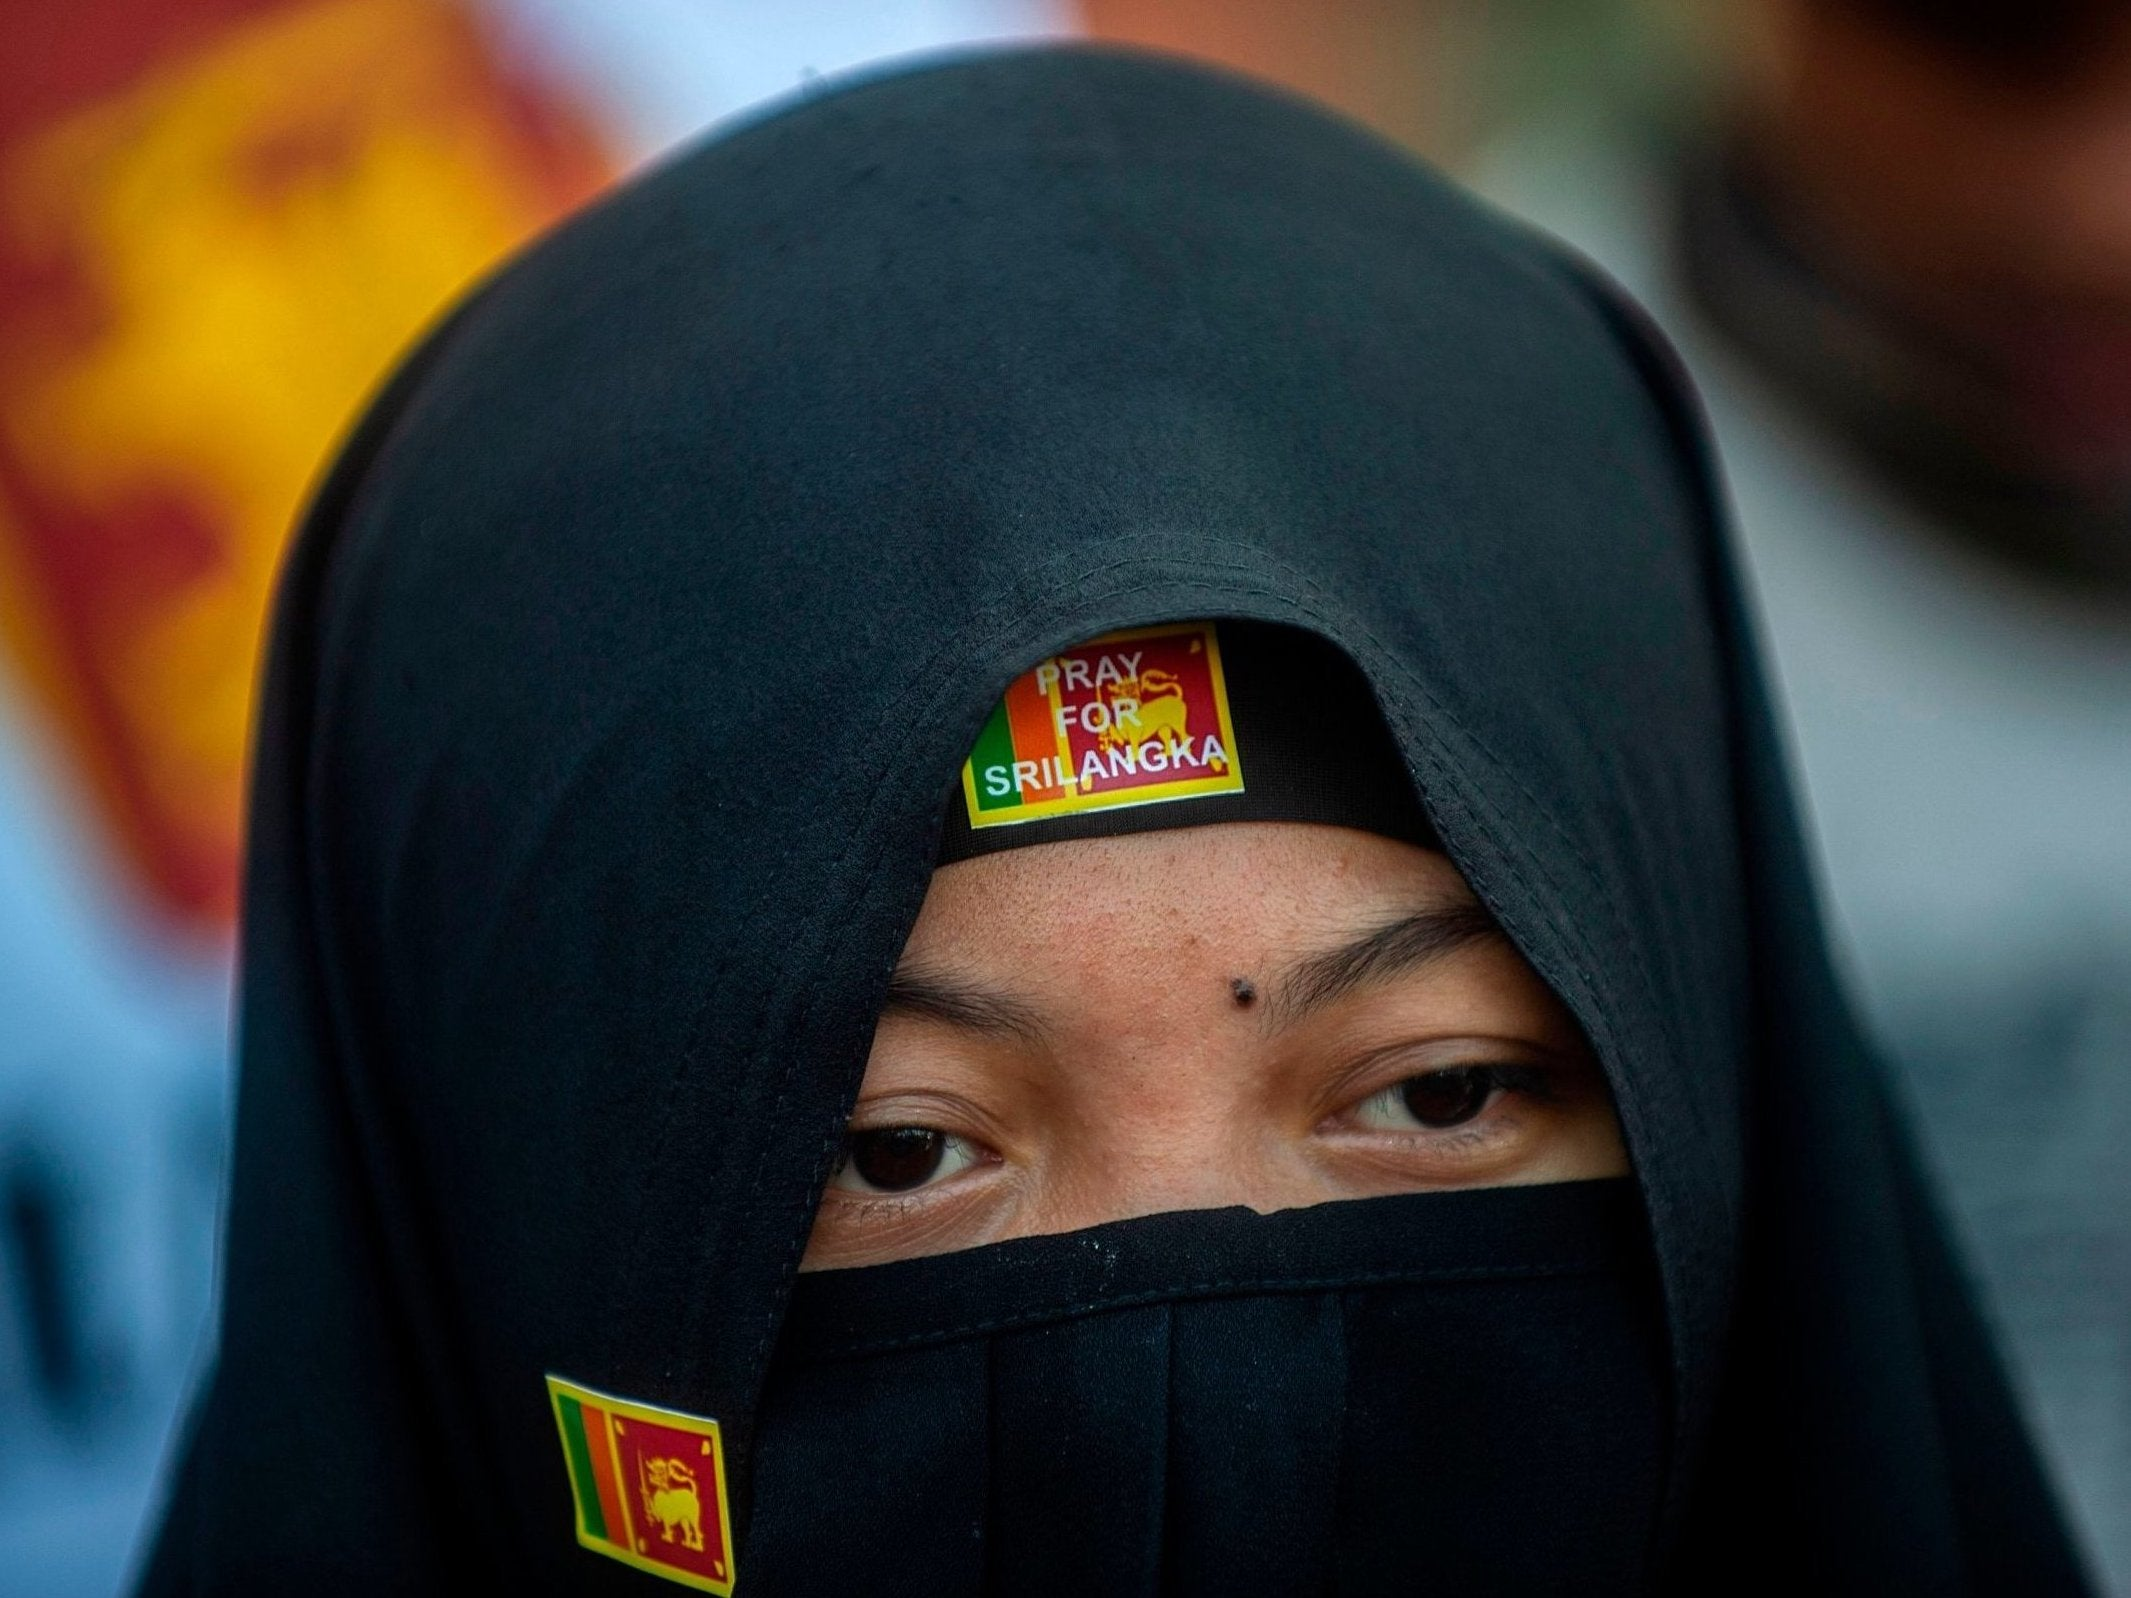 Burqa ban: Sri Lanka bars Muslim women from wearing face veils after